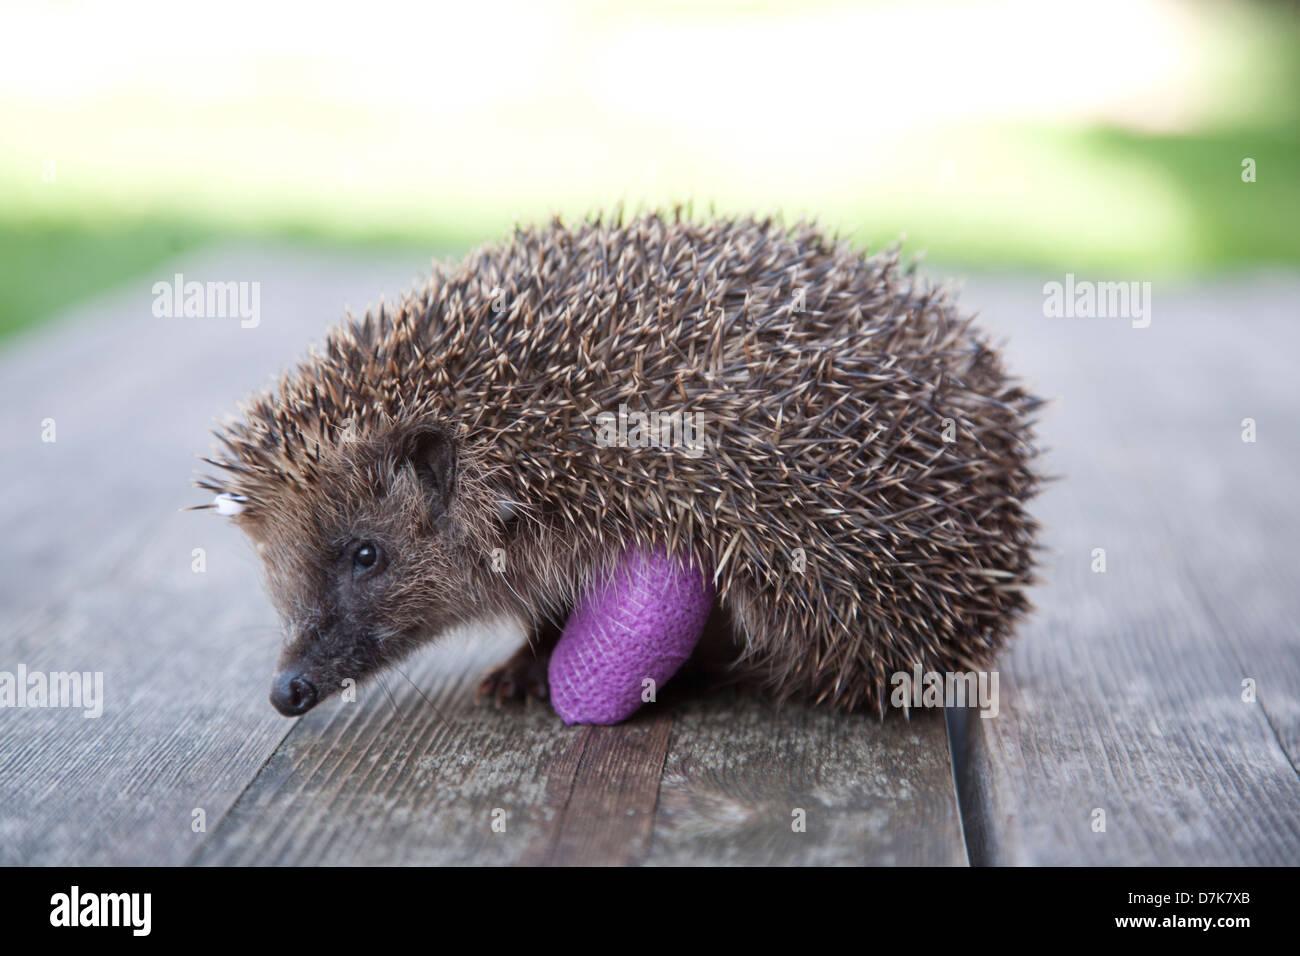 European Hedgehog with bandage on broken leg - Stock Image